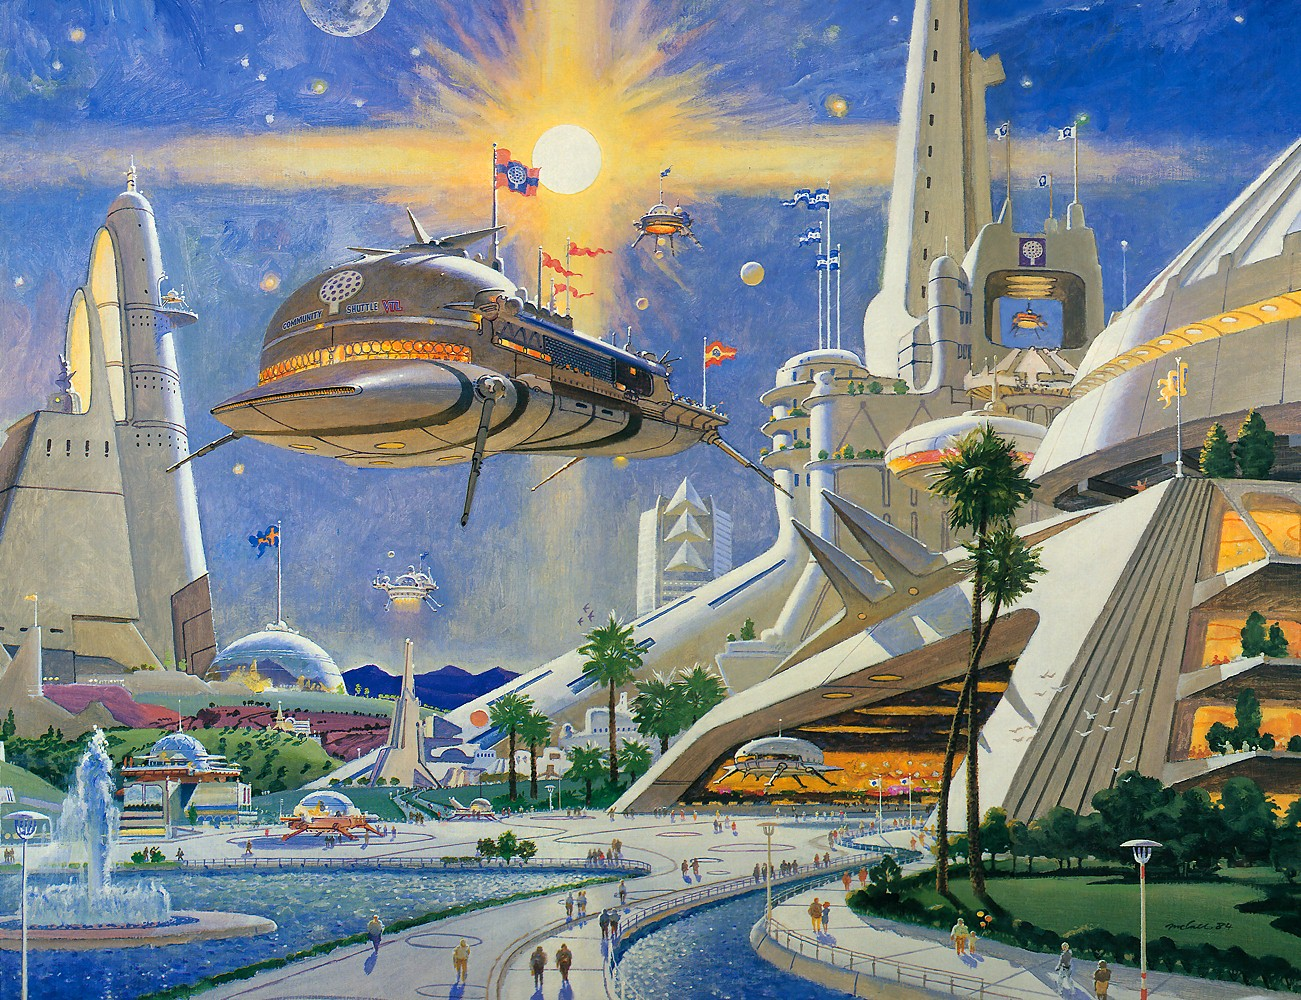 am-Robert_McCall_Metropolis_2050_#3